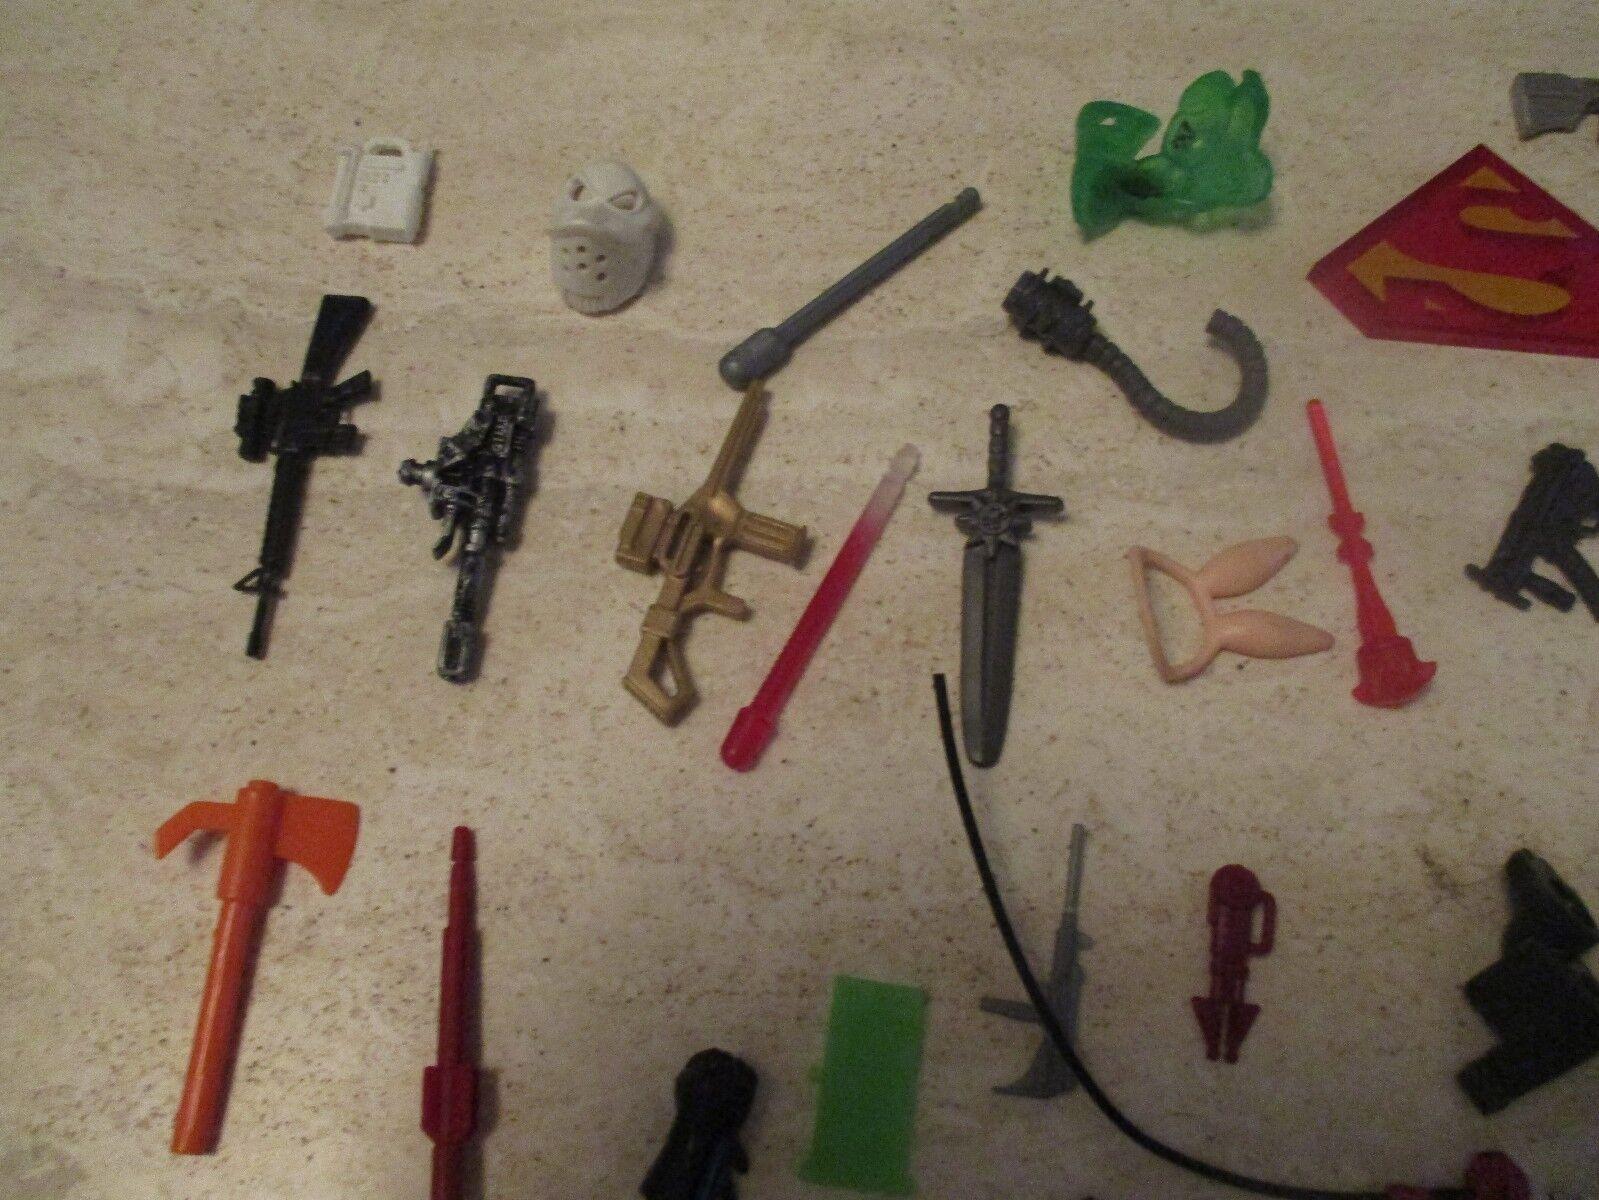 Lot Lot Lot of 50+ Reom Assorted azione cifra Accessories- Guns, Missiles e more  2 b9e7a8